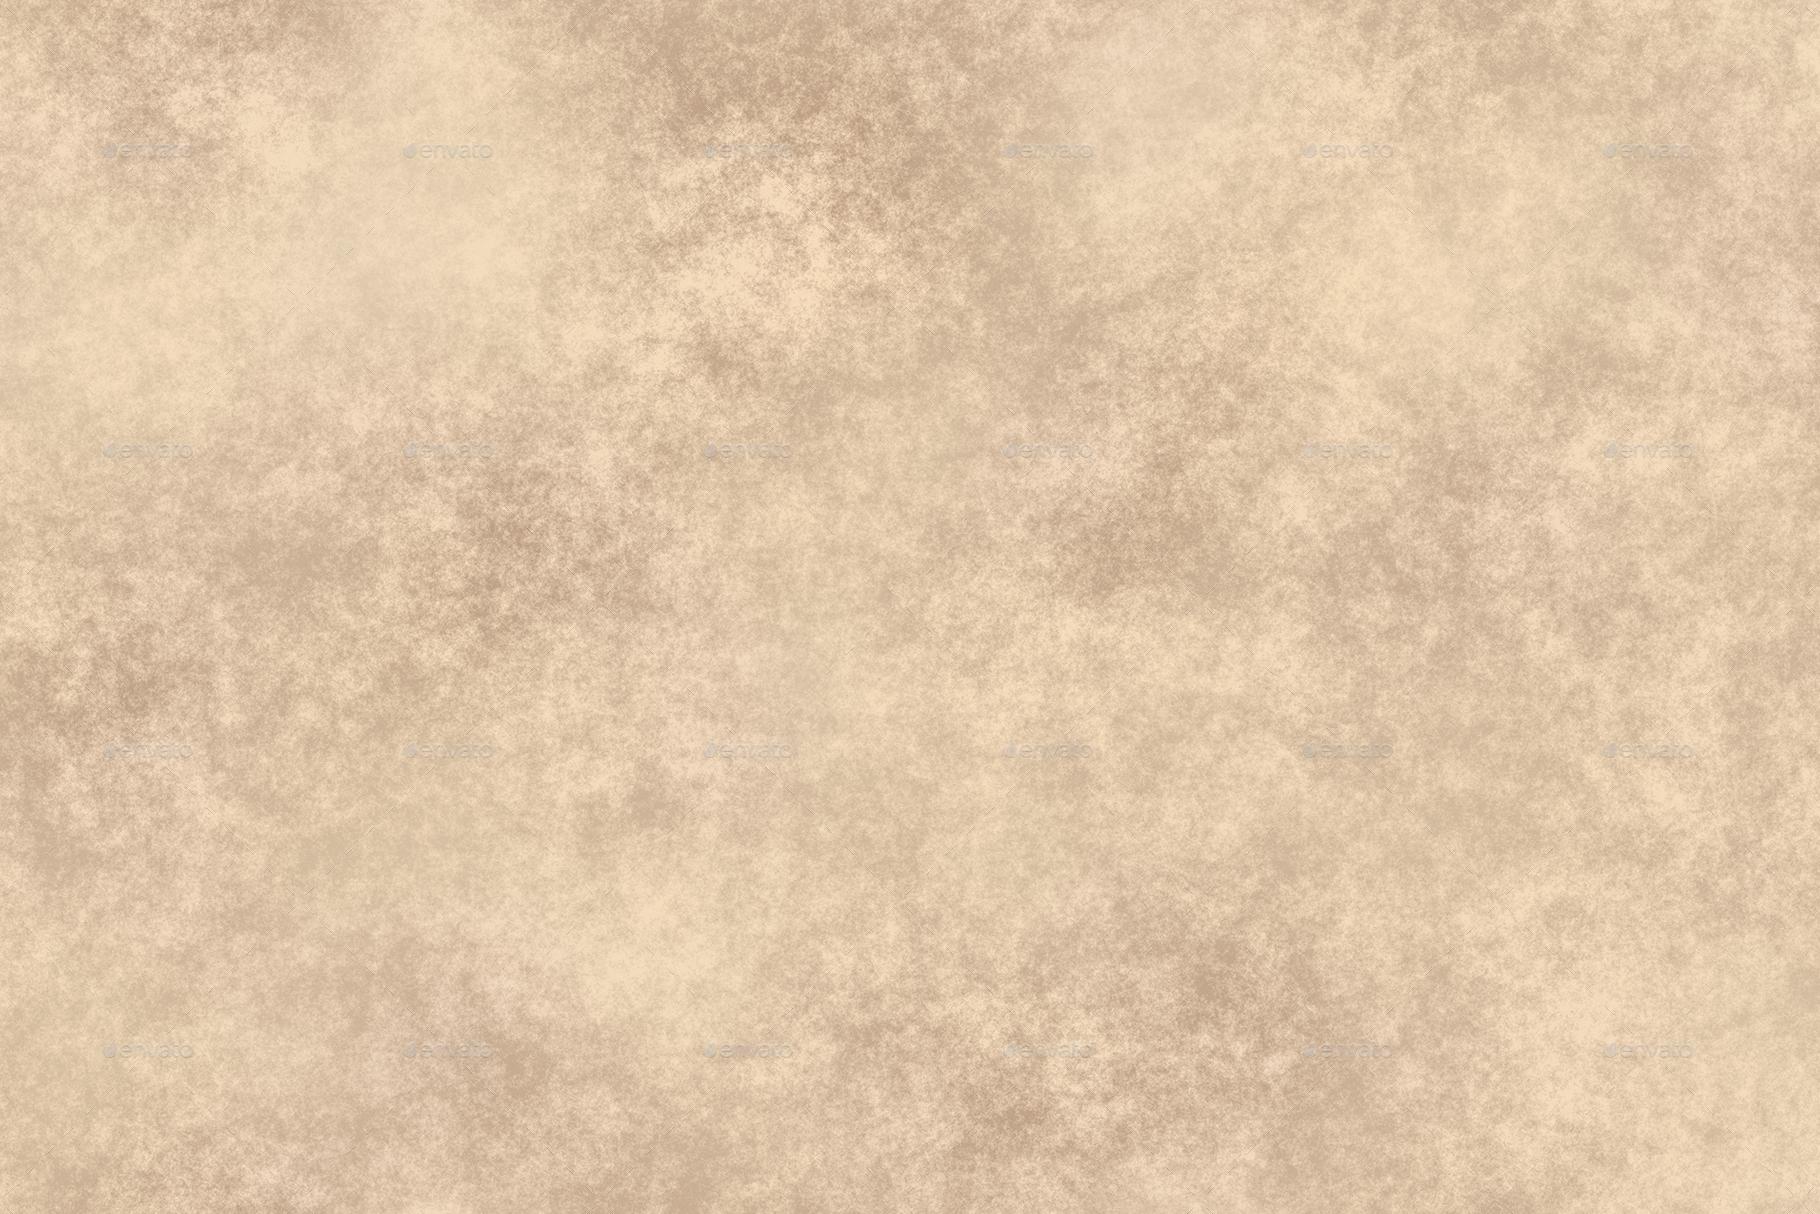 10 skull bone background textures by webcombo 3docean